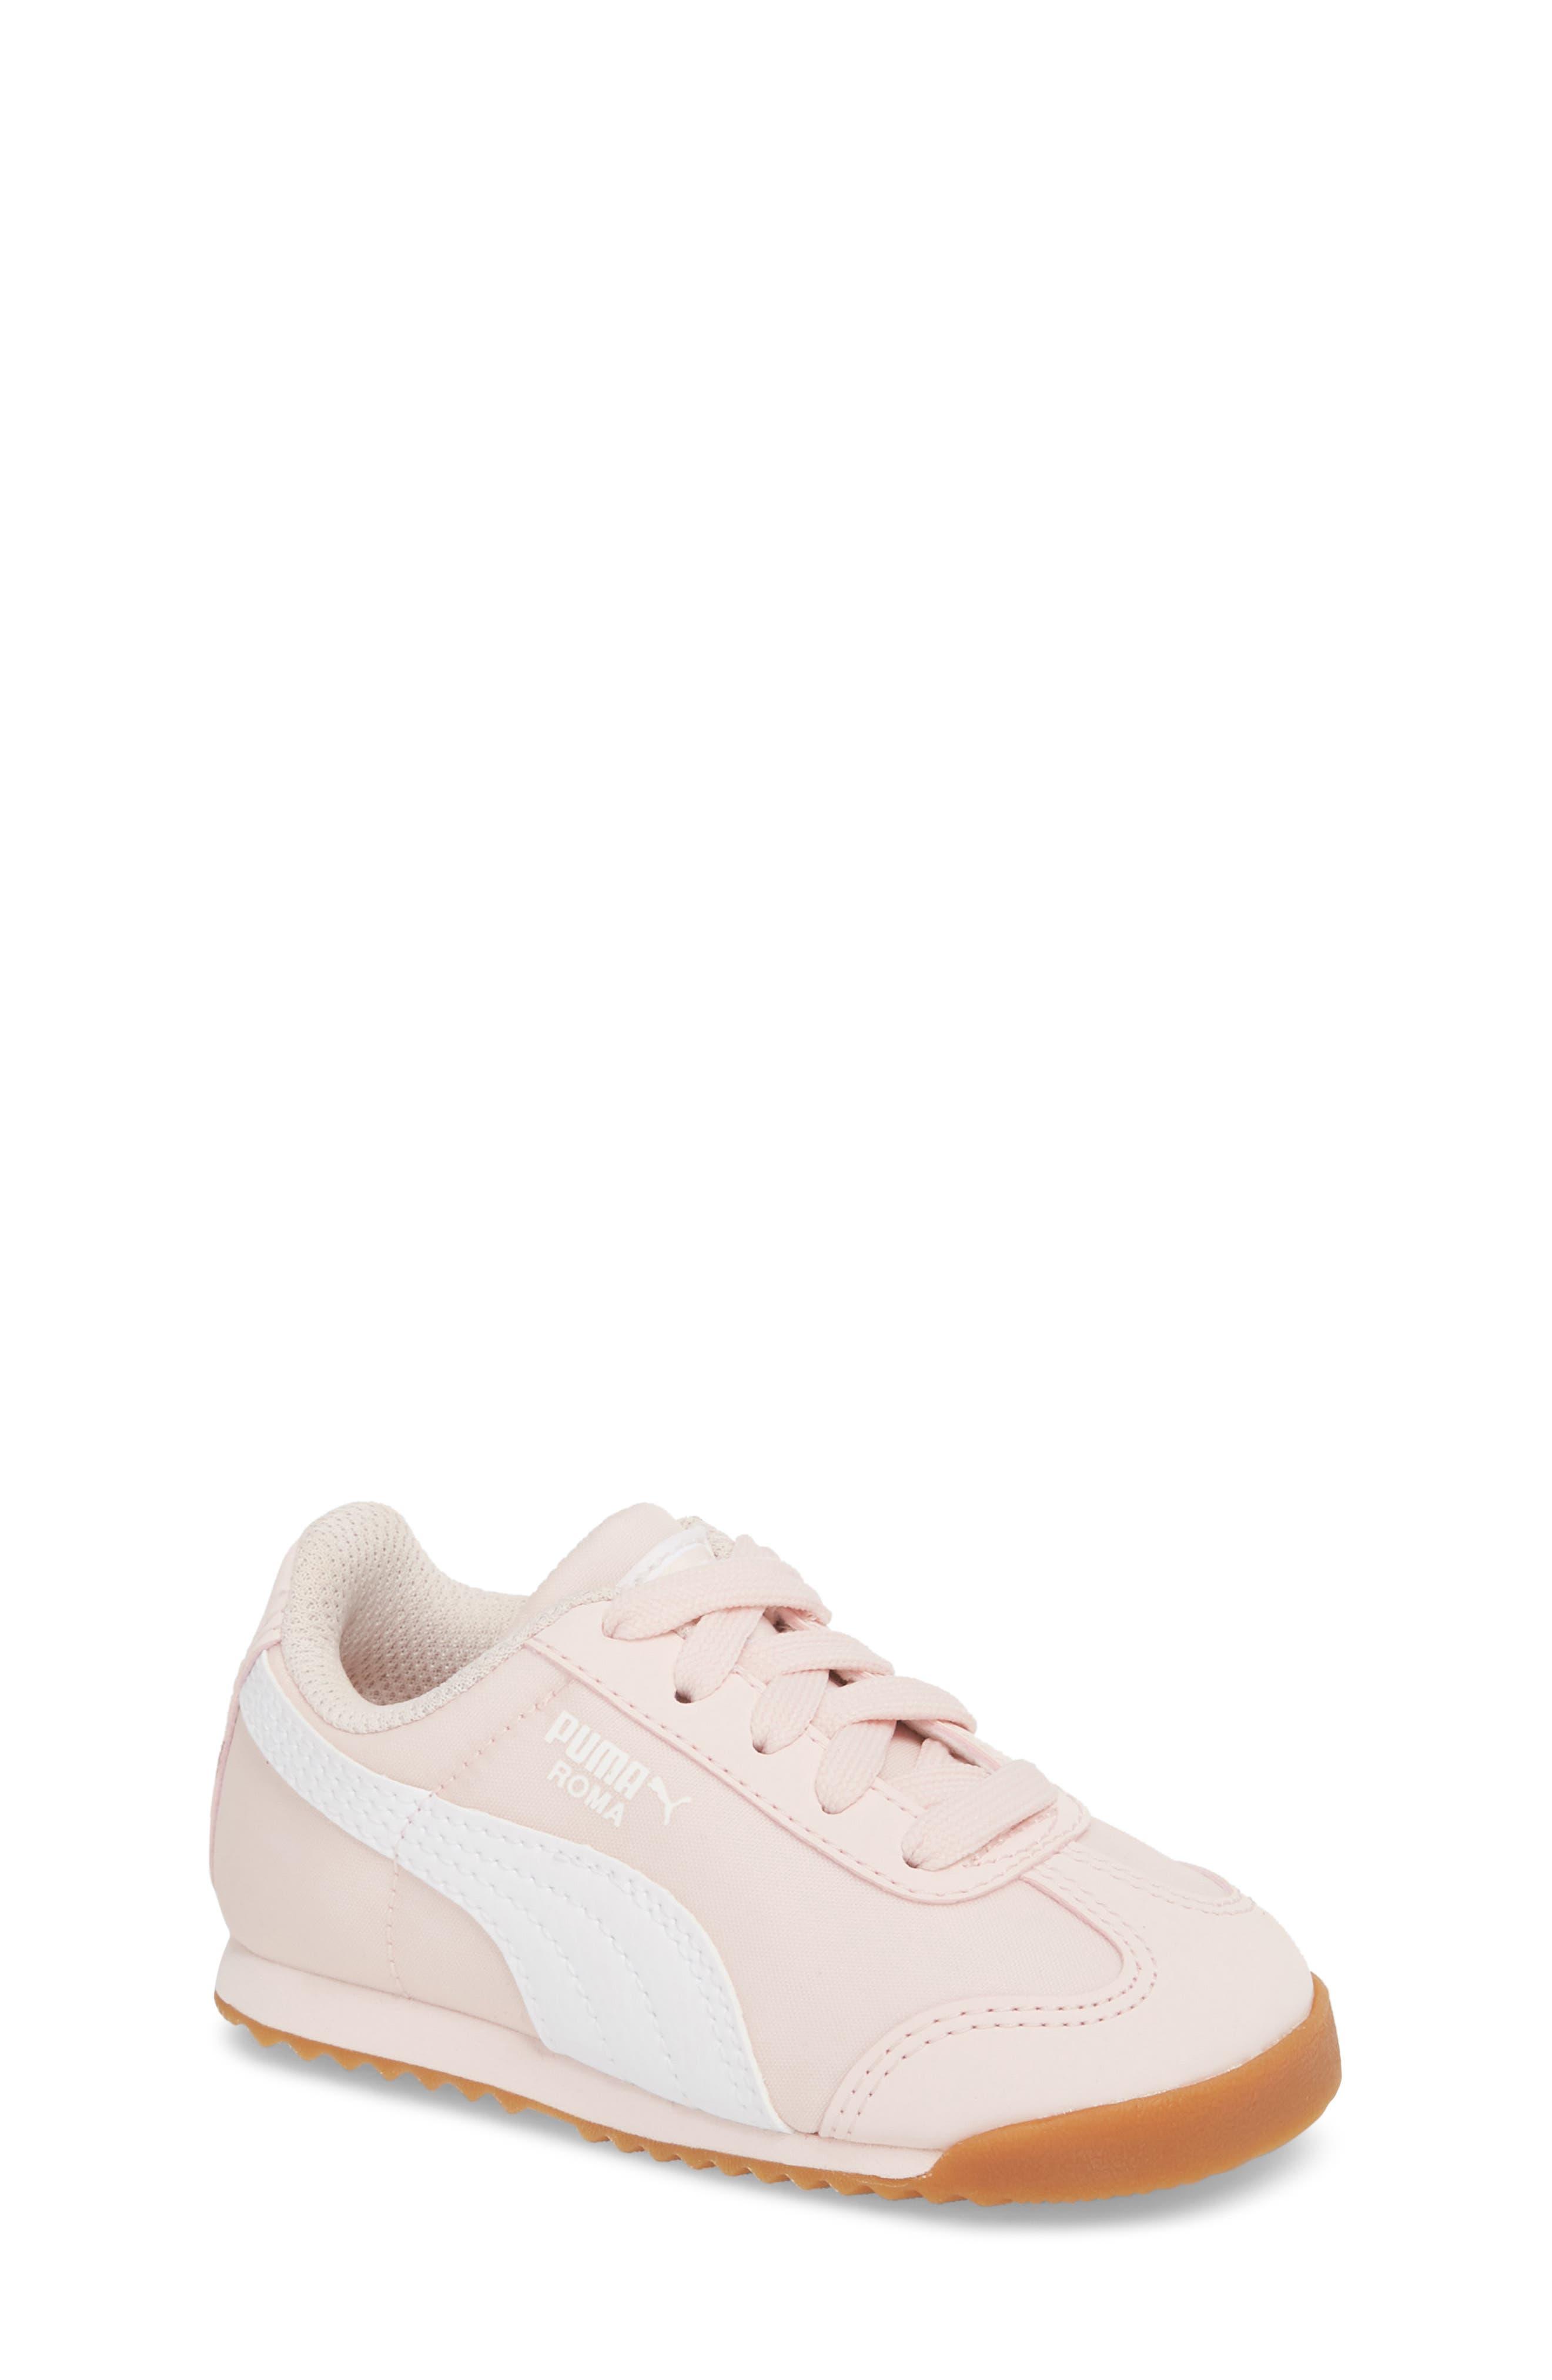 Roma Basic Summer Sneaker,                         Main,                         color, Pearl/ White